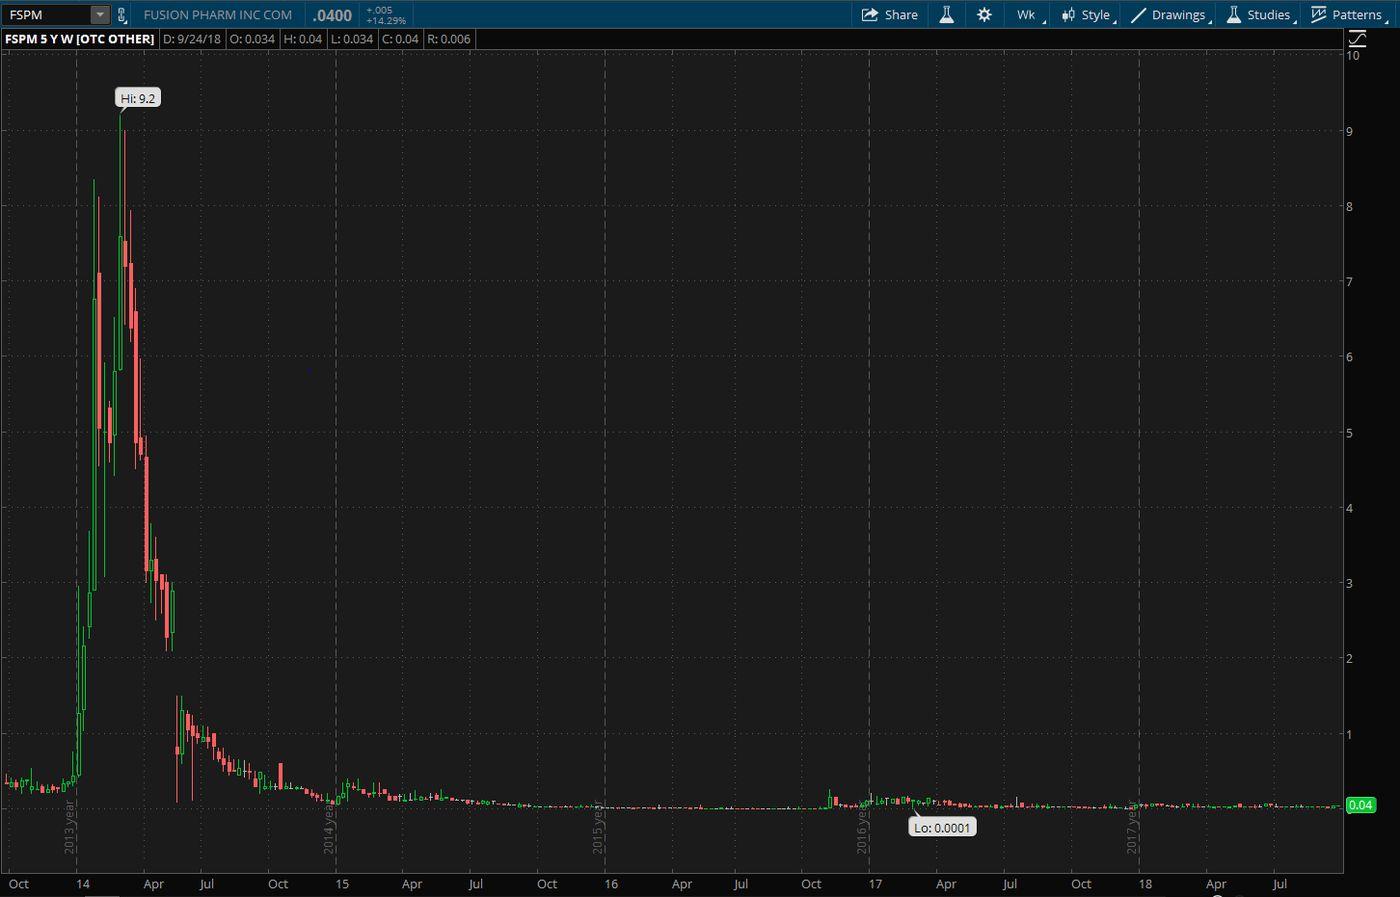 fusion-pharma-investing-in-marijuana-stocks-tilray-cannabis-pot-stocks.png